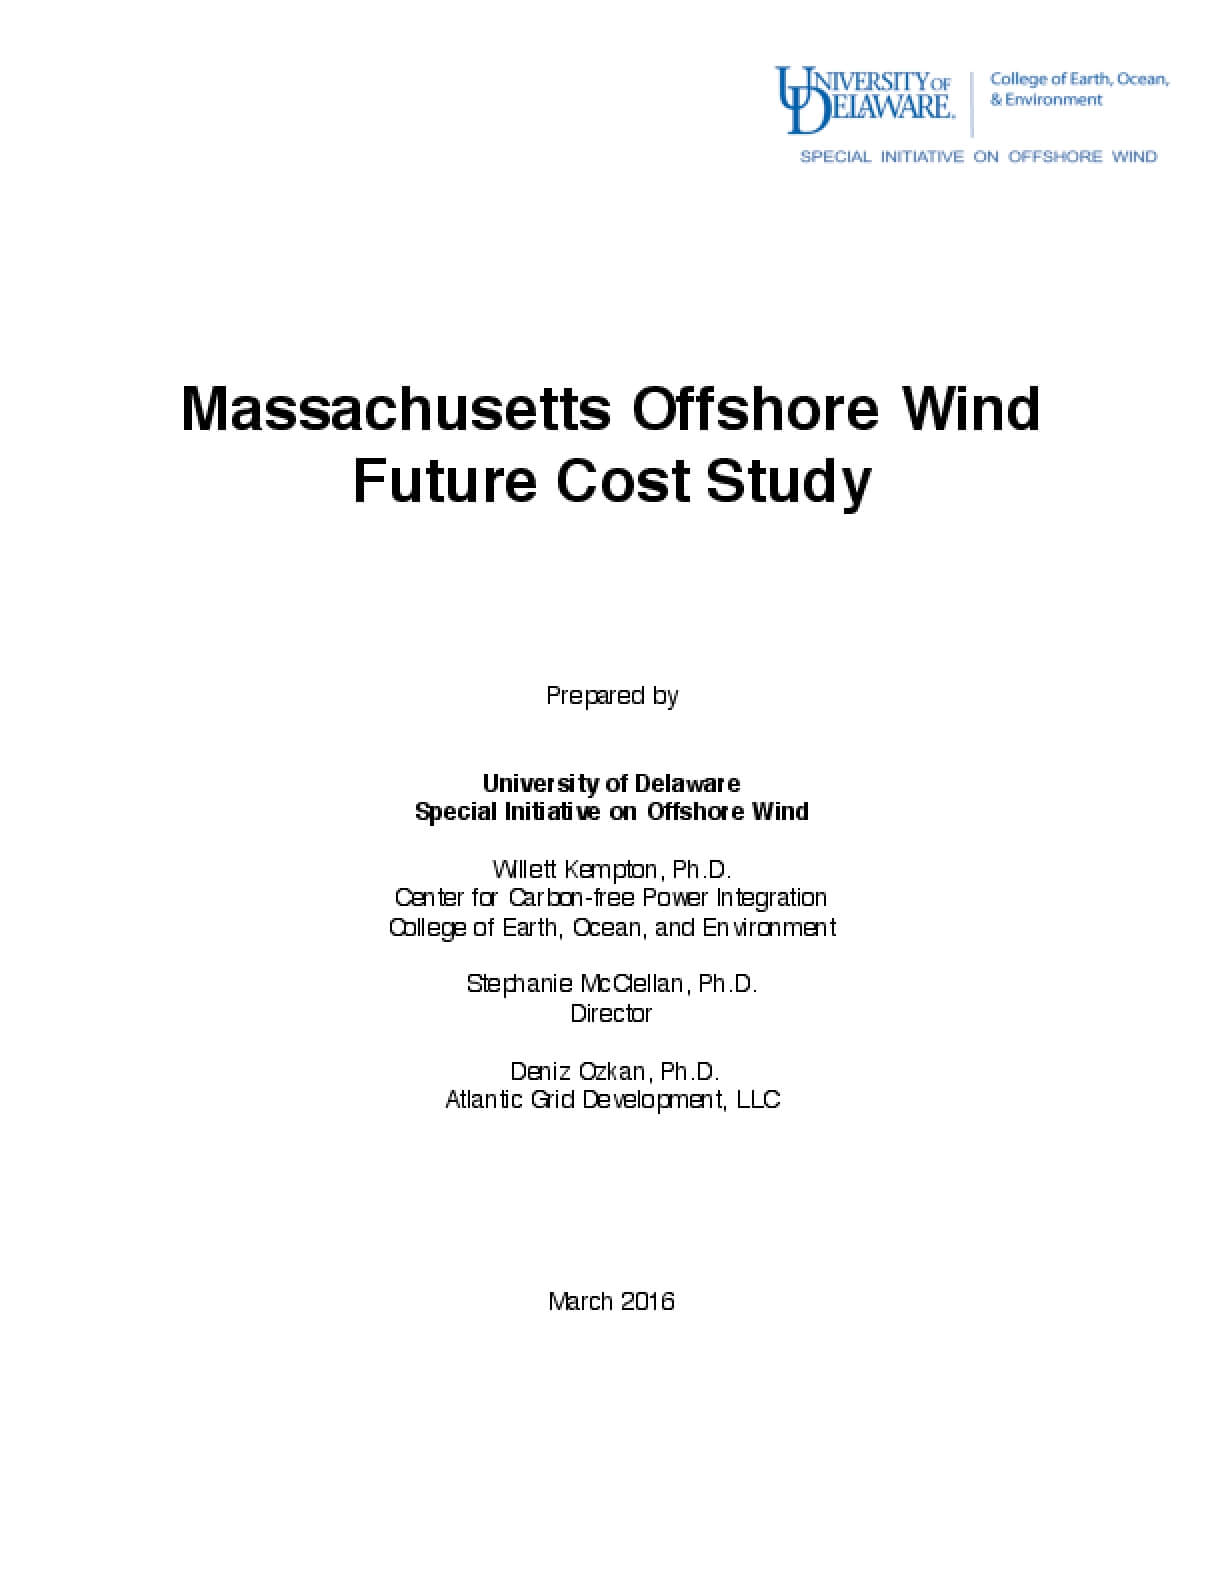 Massachusetts Offshore Wind Future Cost Study